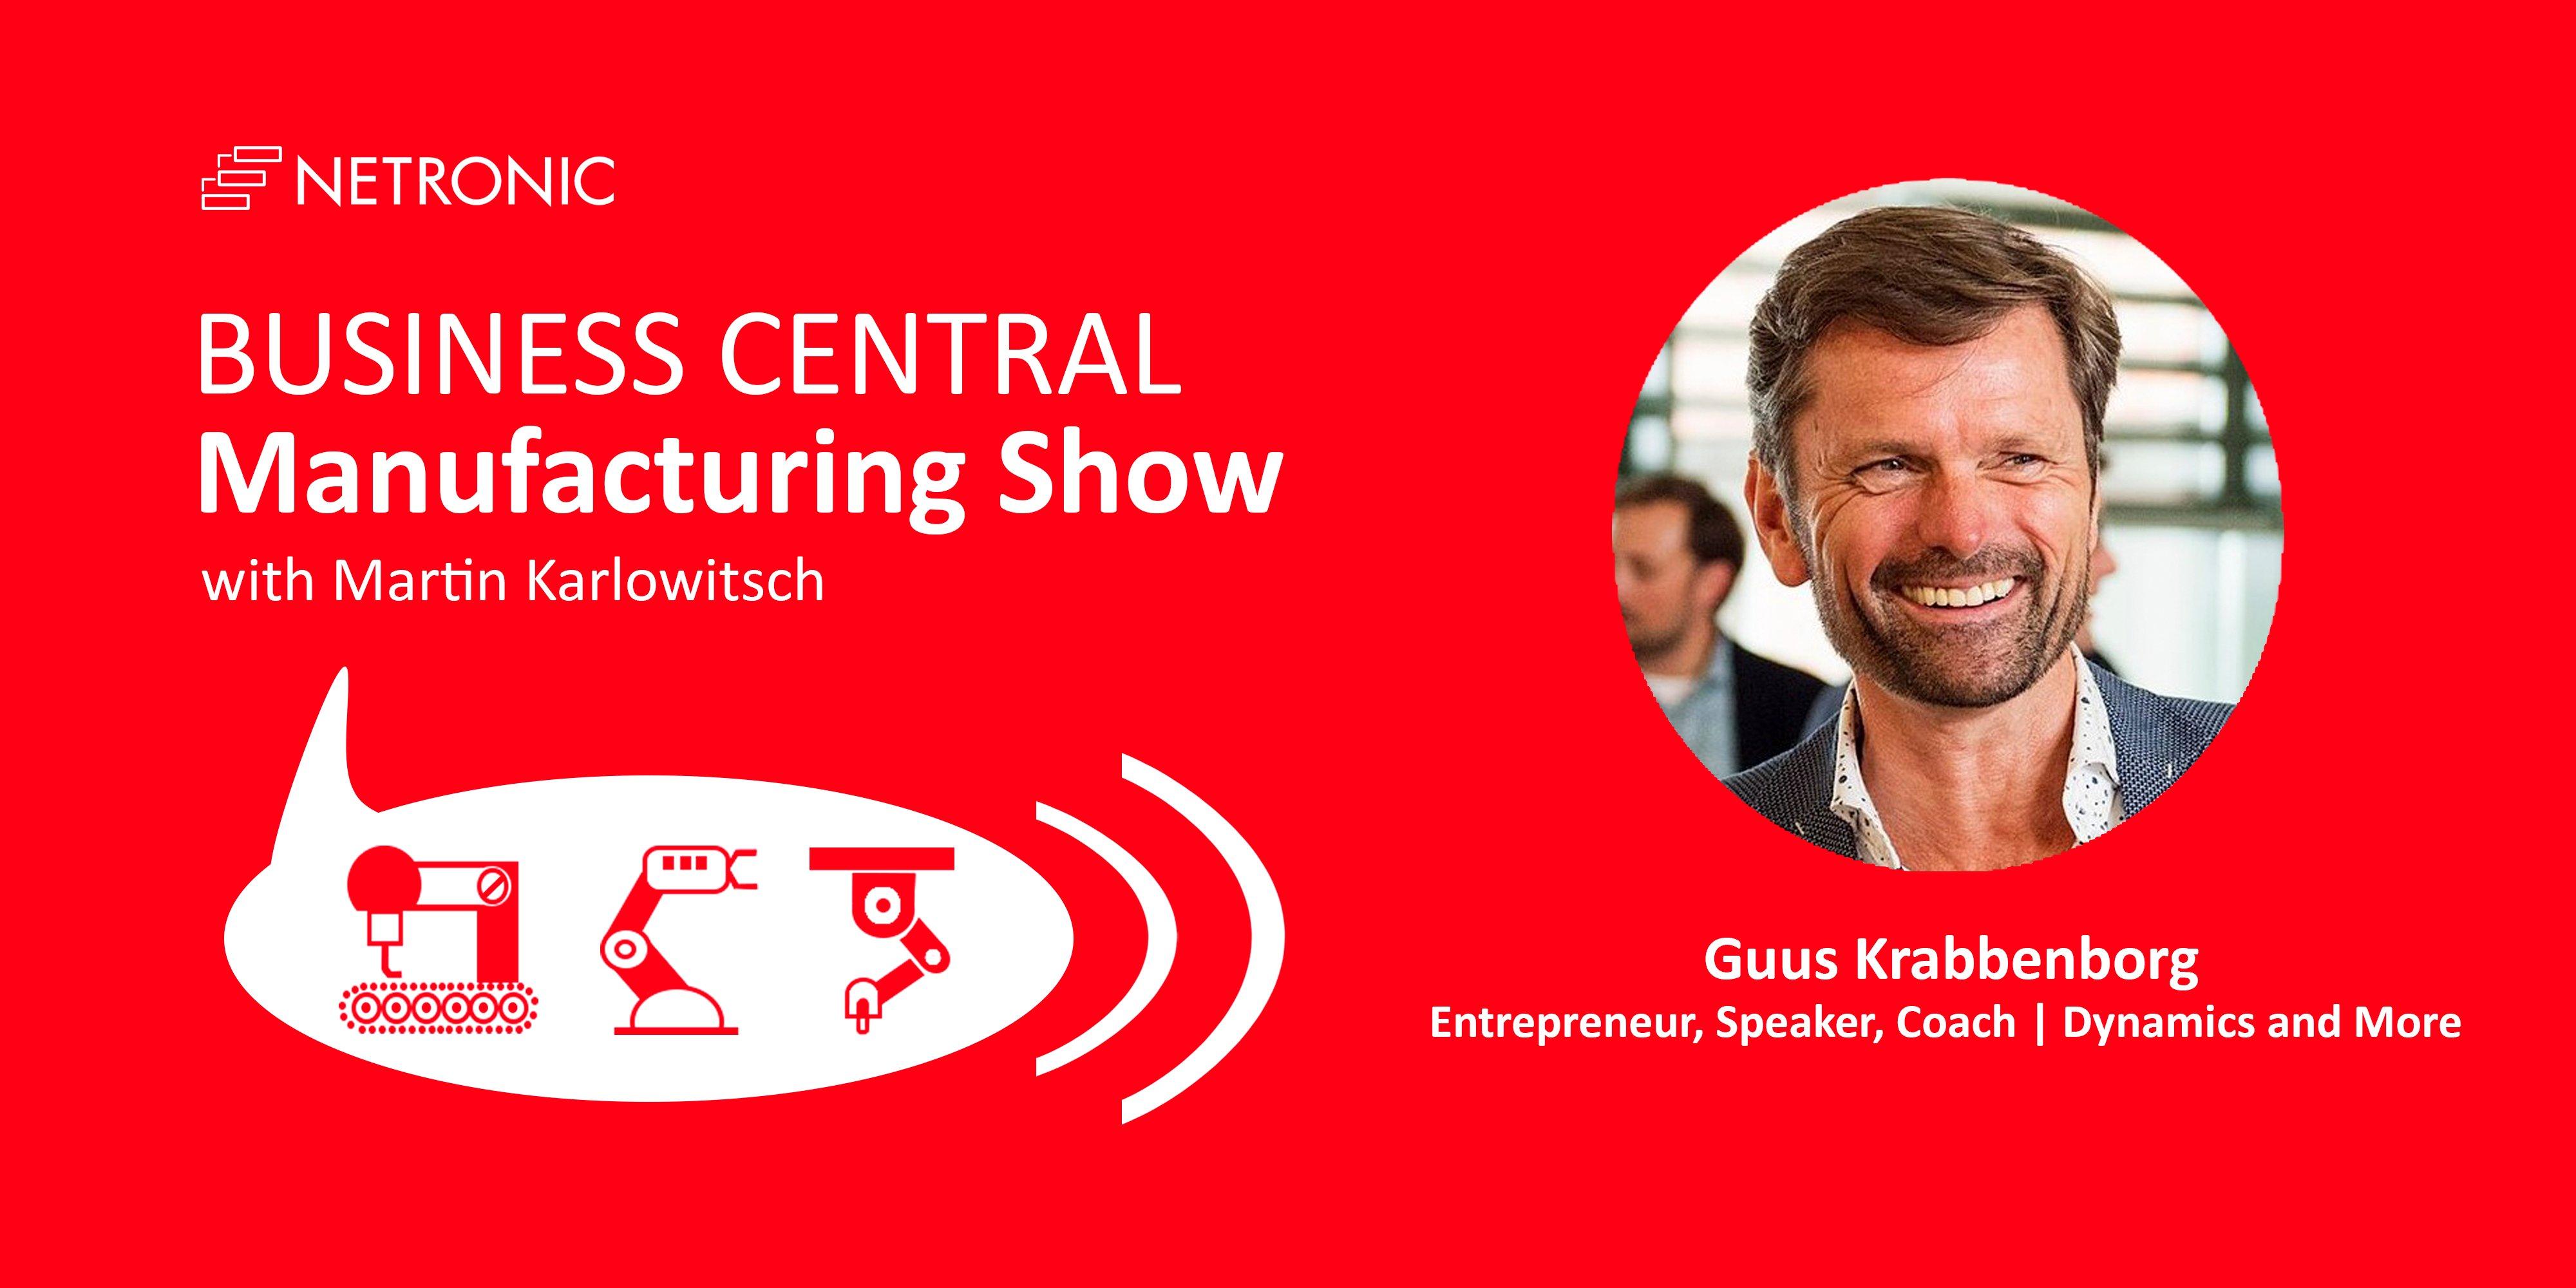 Business Central Manufacturing Show Guus Krabbenborg